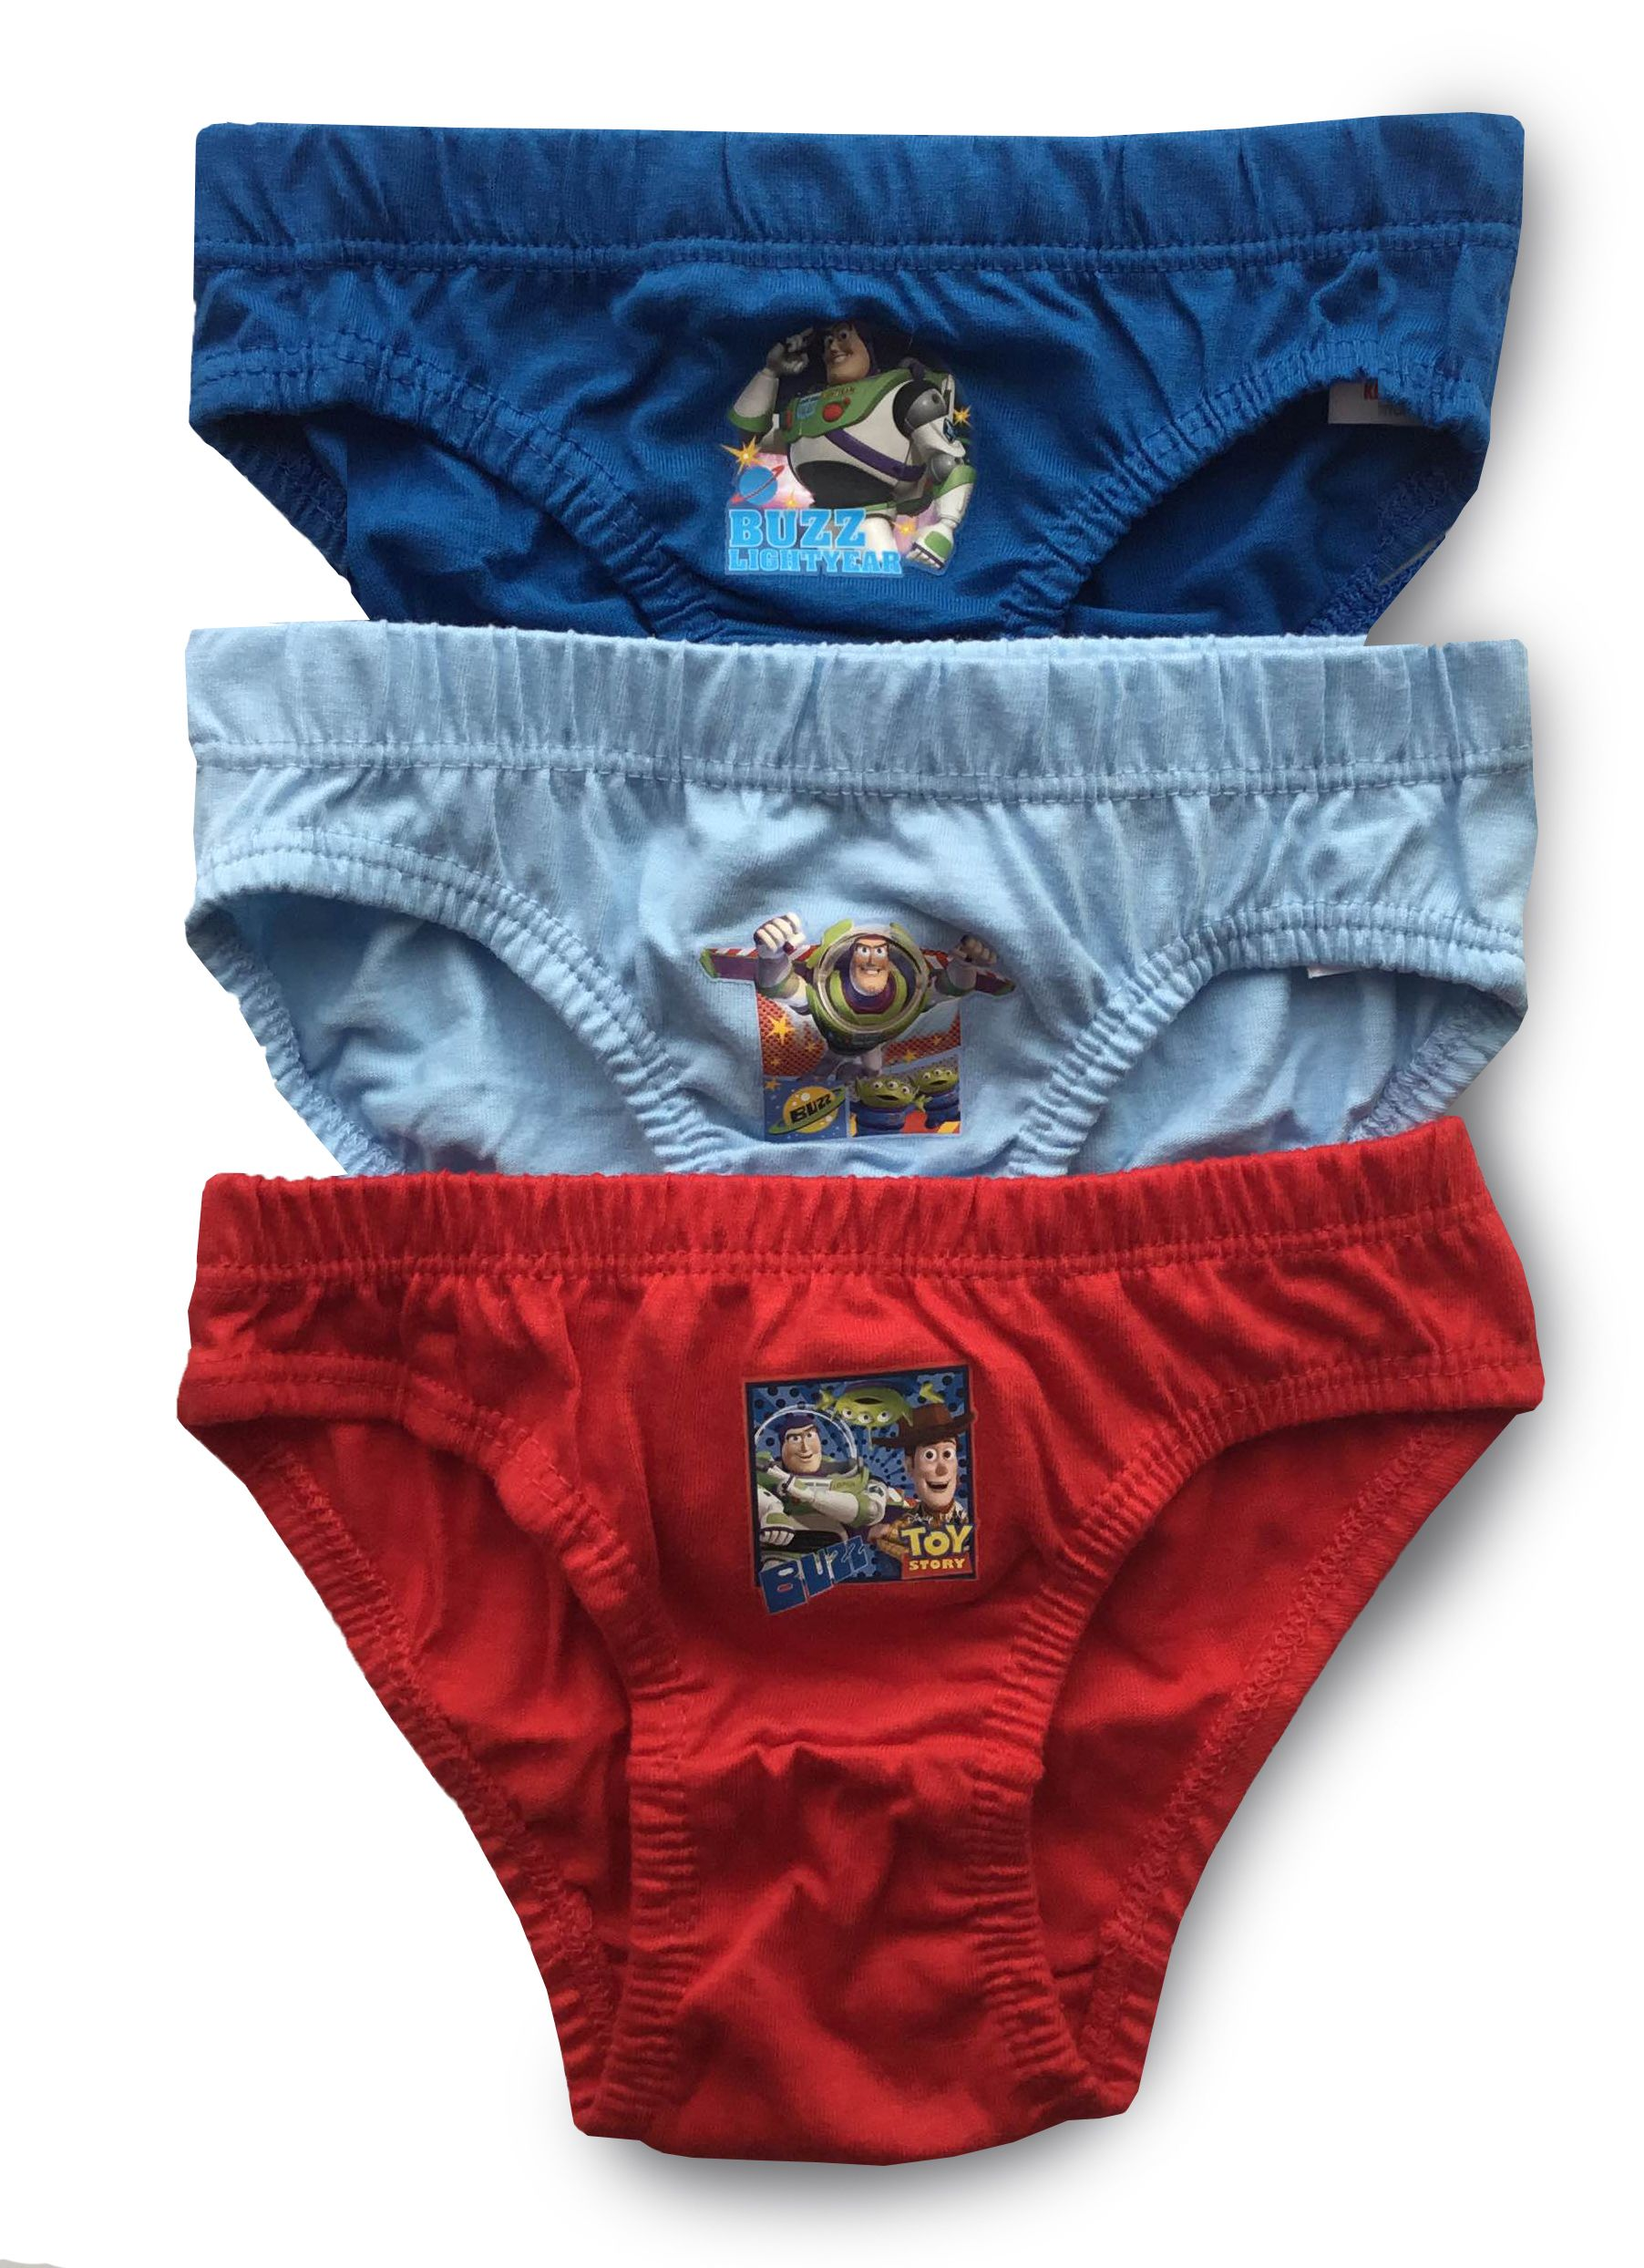 Toy Story Pants Briefs Underwear Toystory Disney Pixar Buzz